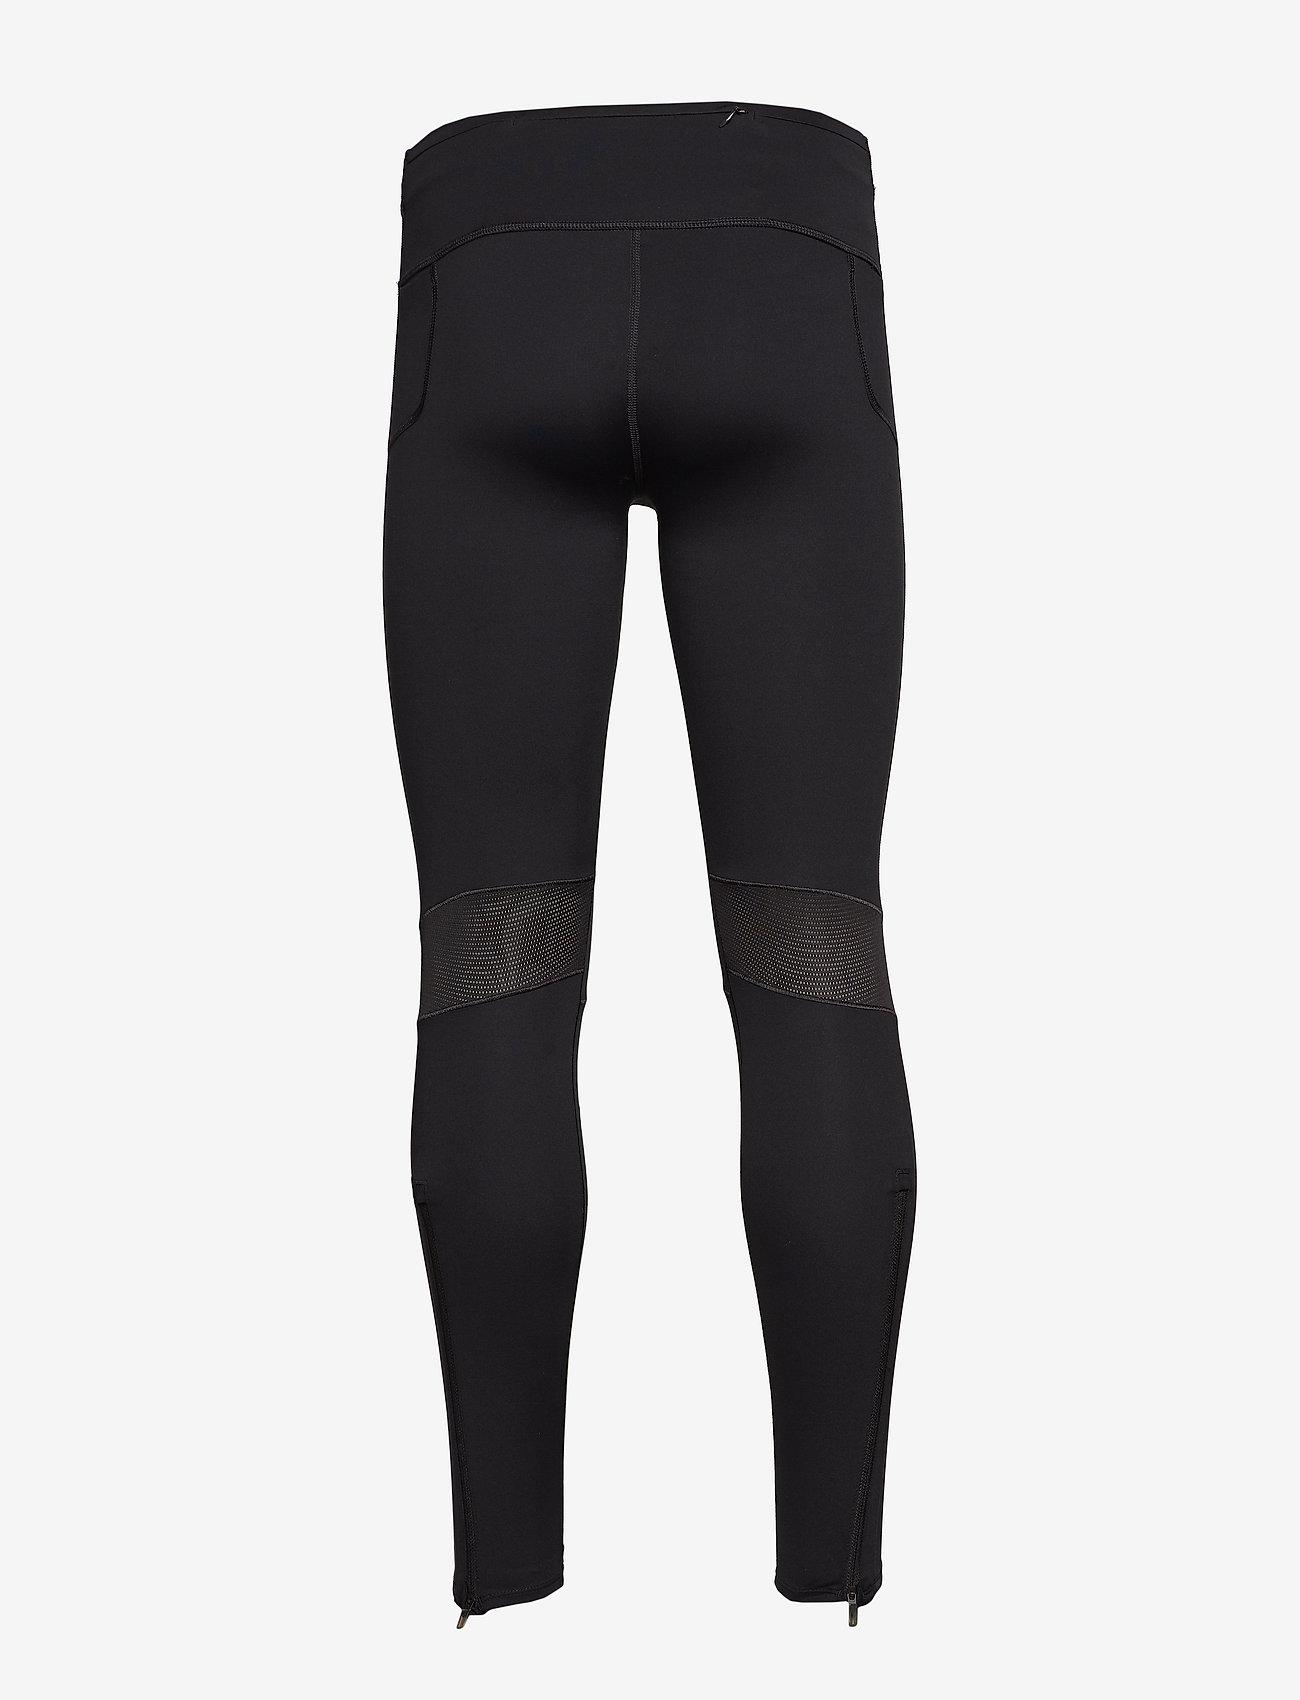 Adidas Performance Saturday Tight - Tights & Shorts Black